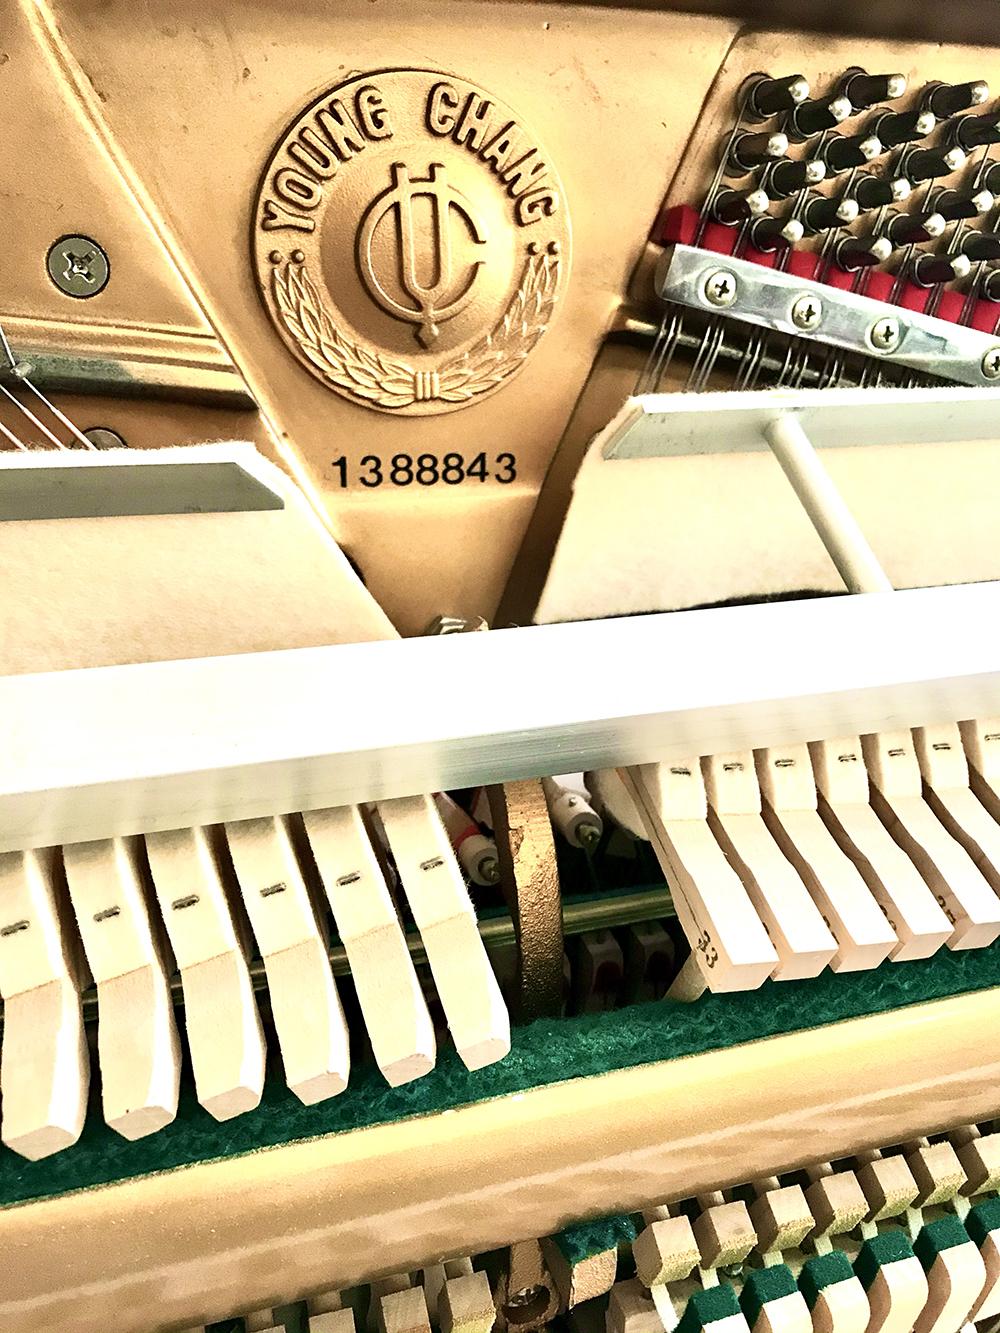 Young-Chang-Piano-Dorset-1.jpg